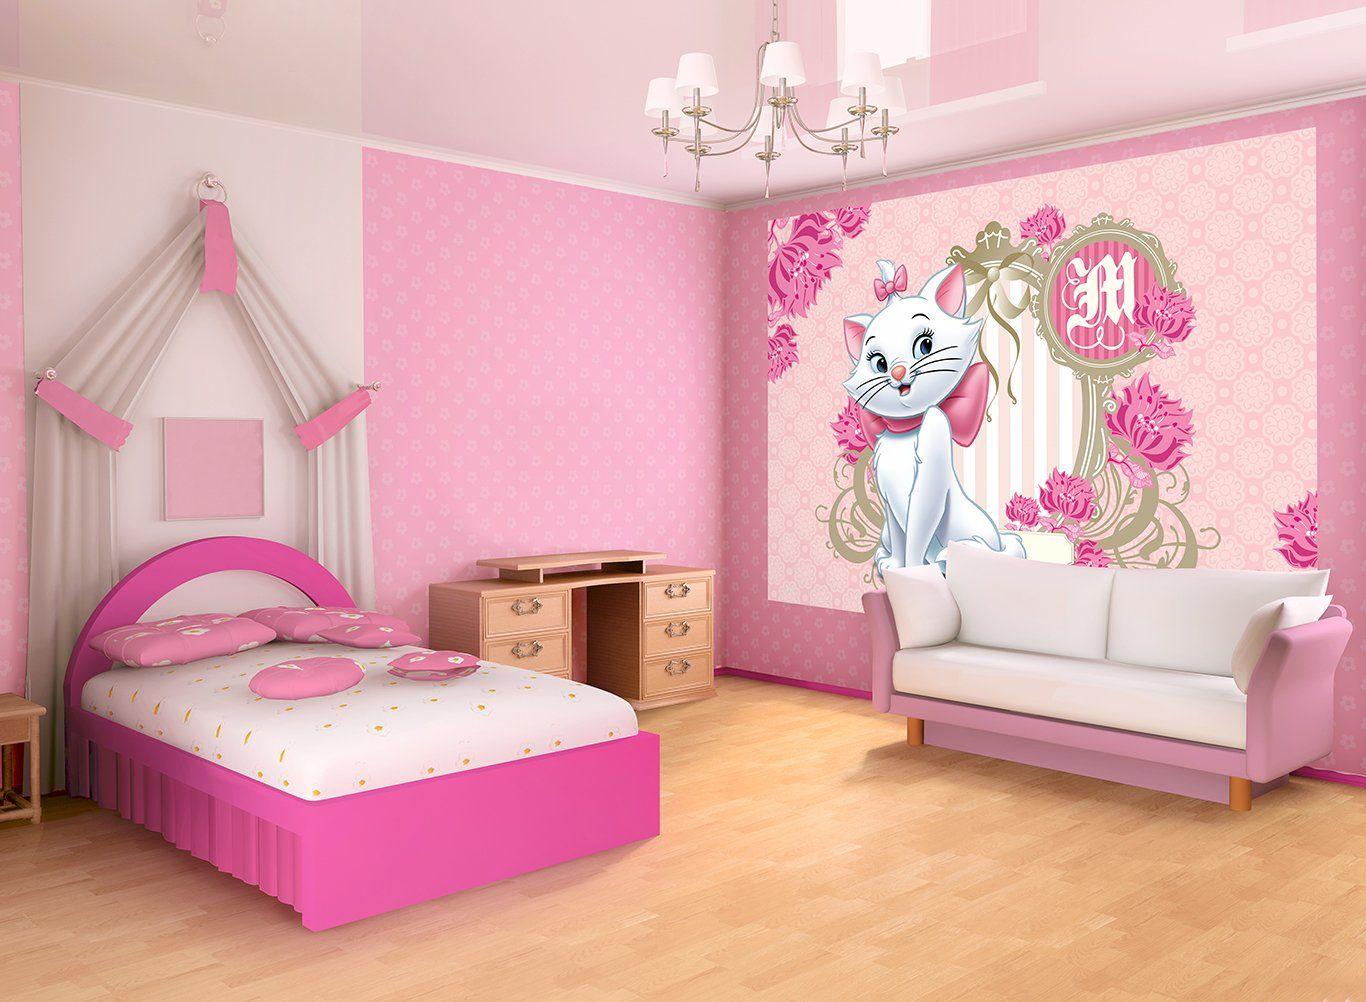 Wallpaper ... marie, Disney, cat, the aristocats | Baby ...